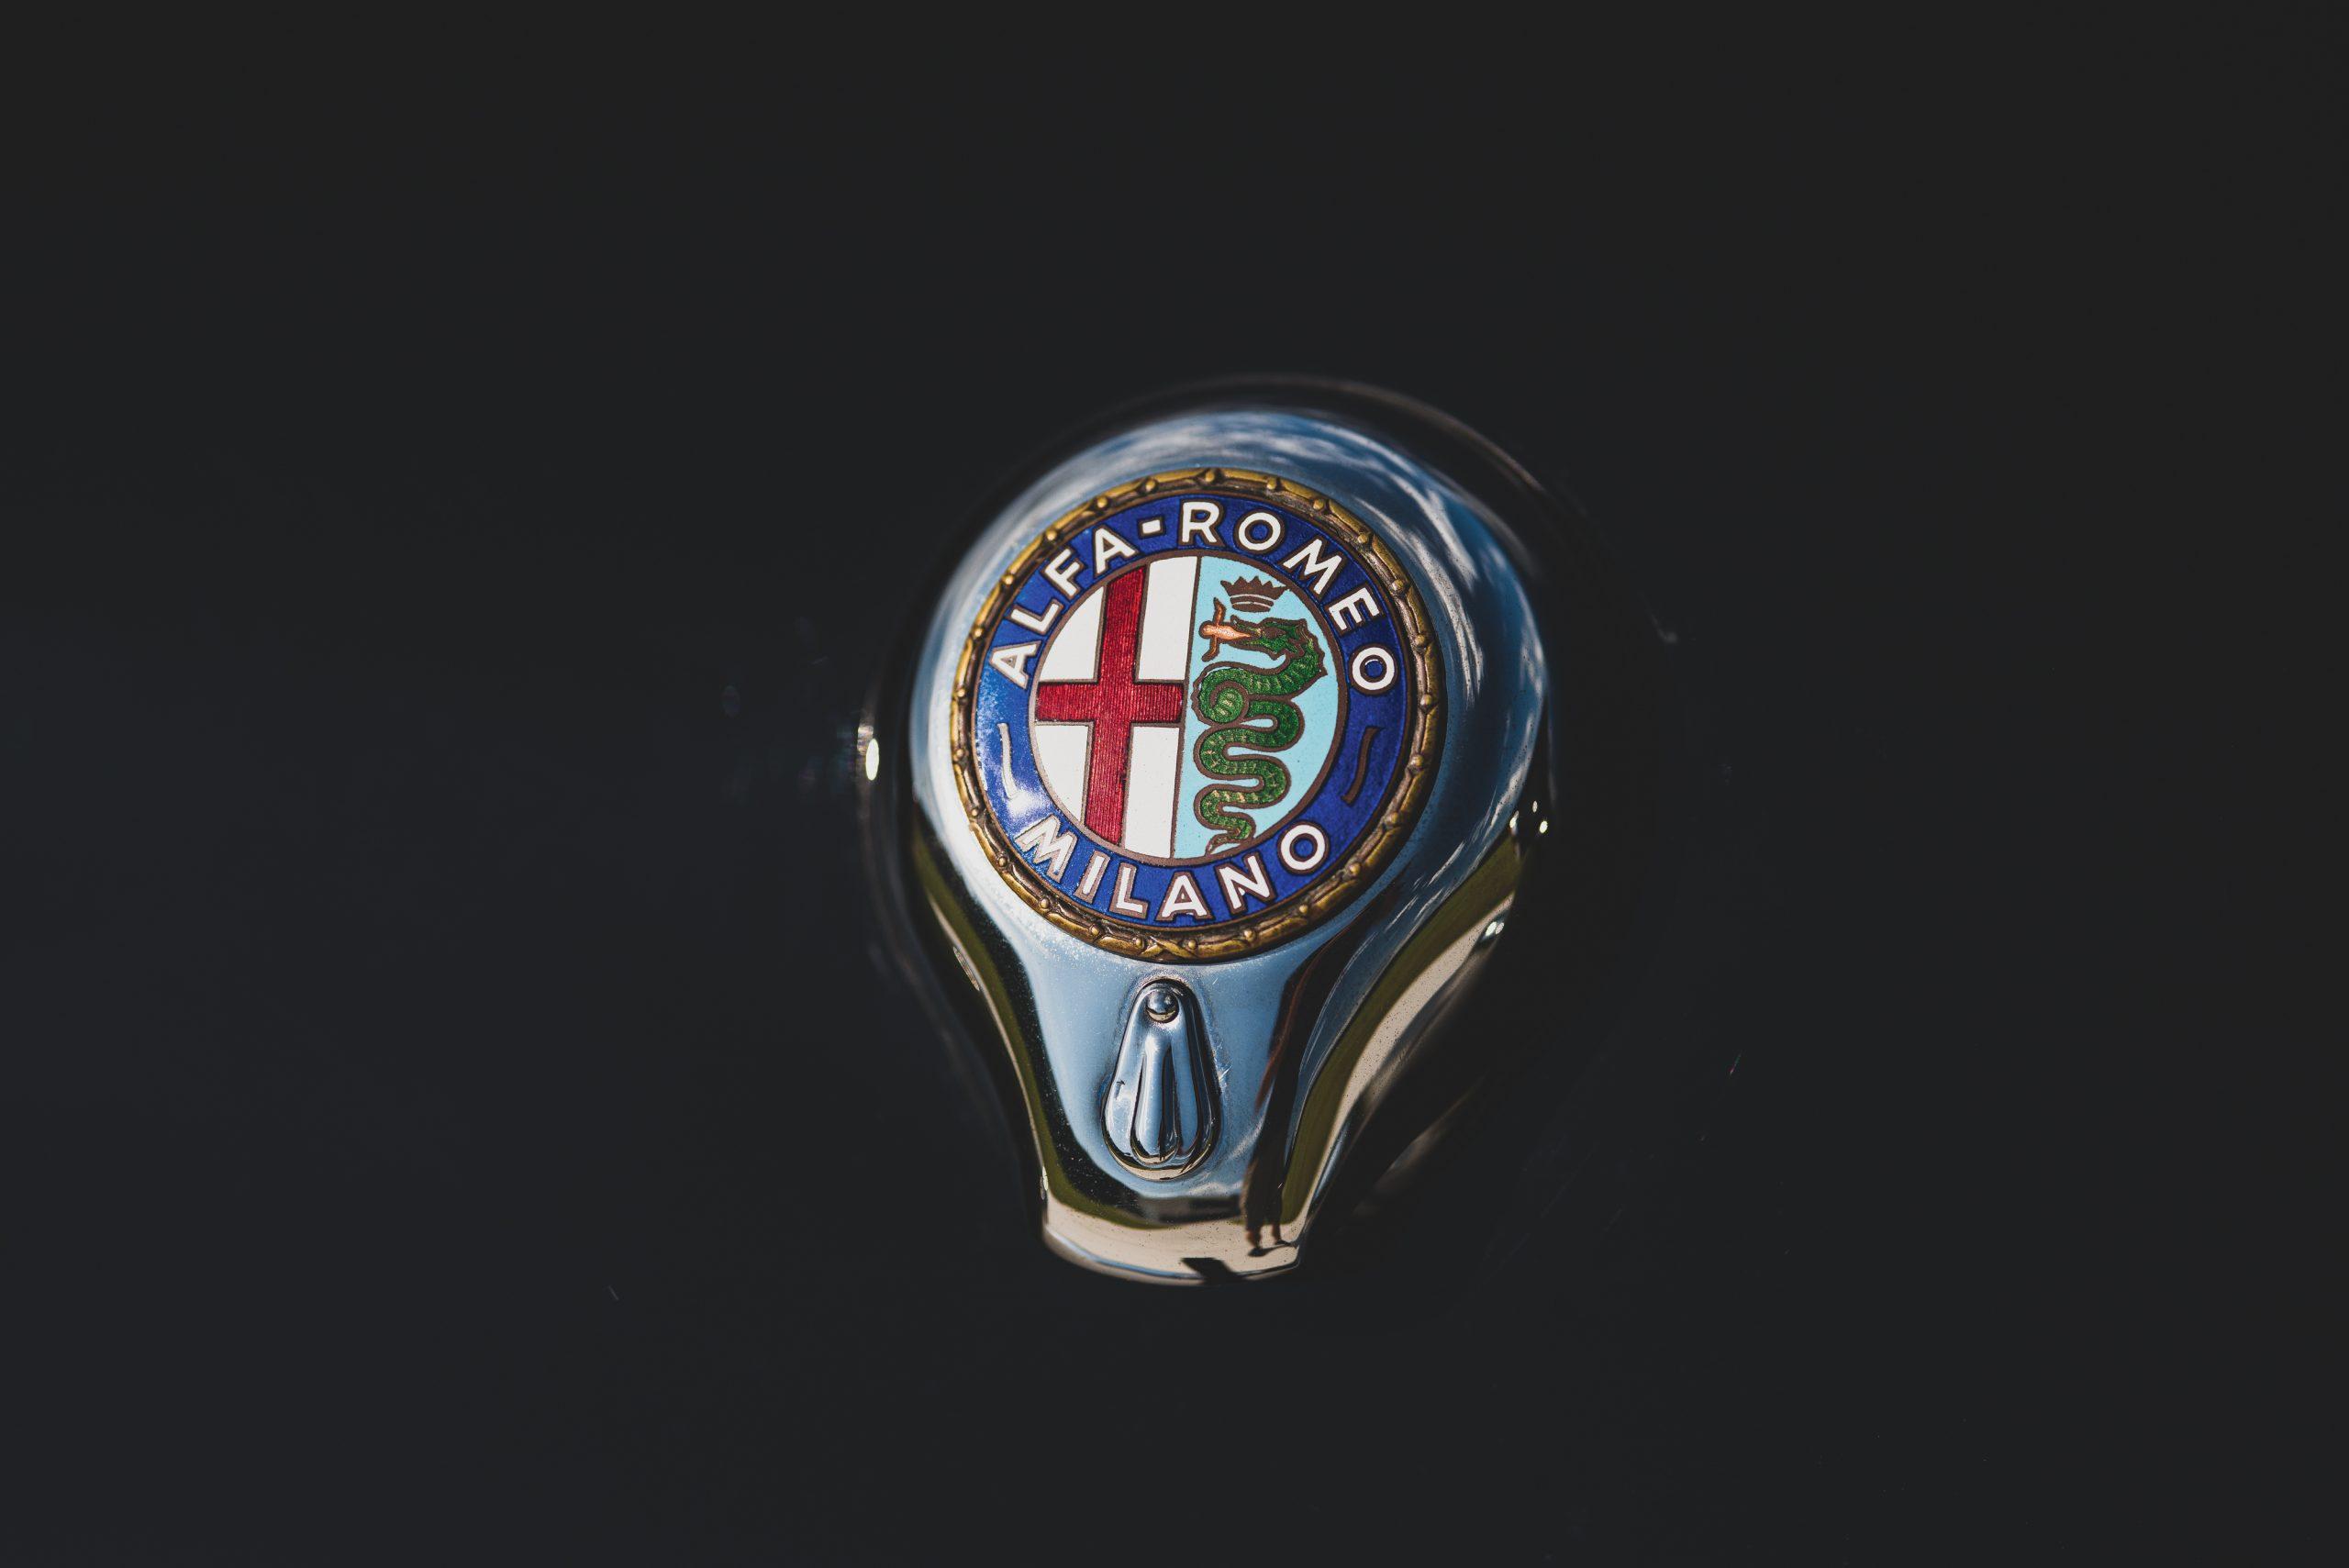 1959 Alfa Romeo Giulietta Spider logo badge